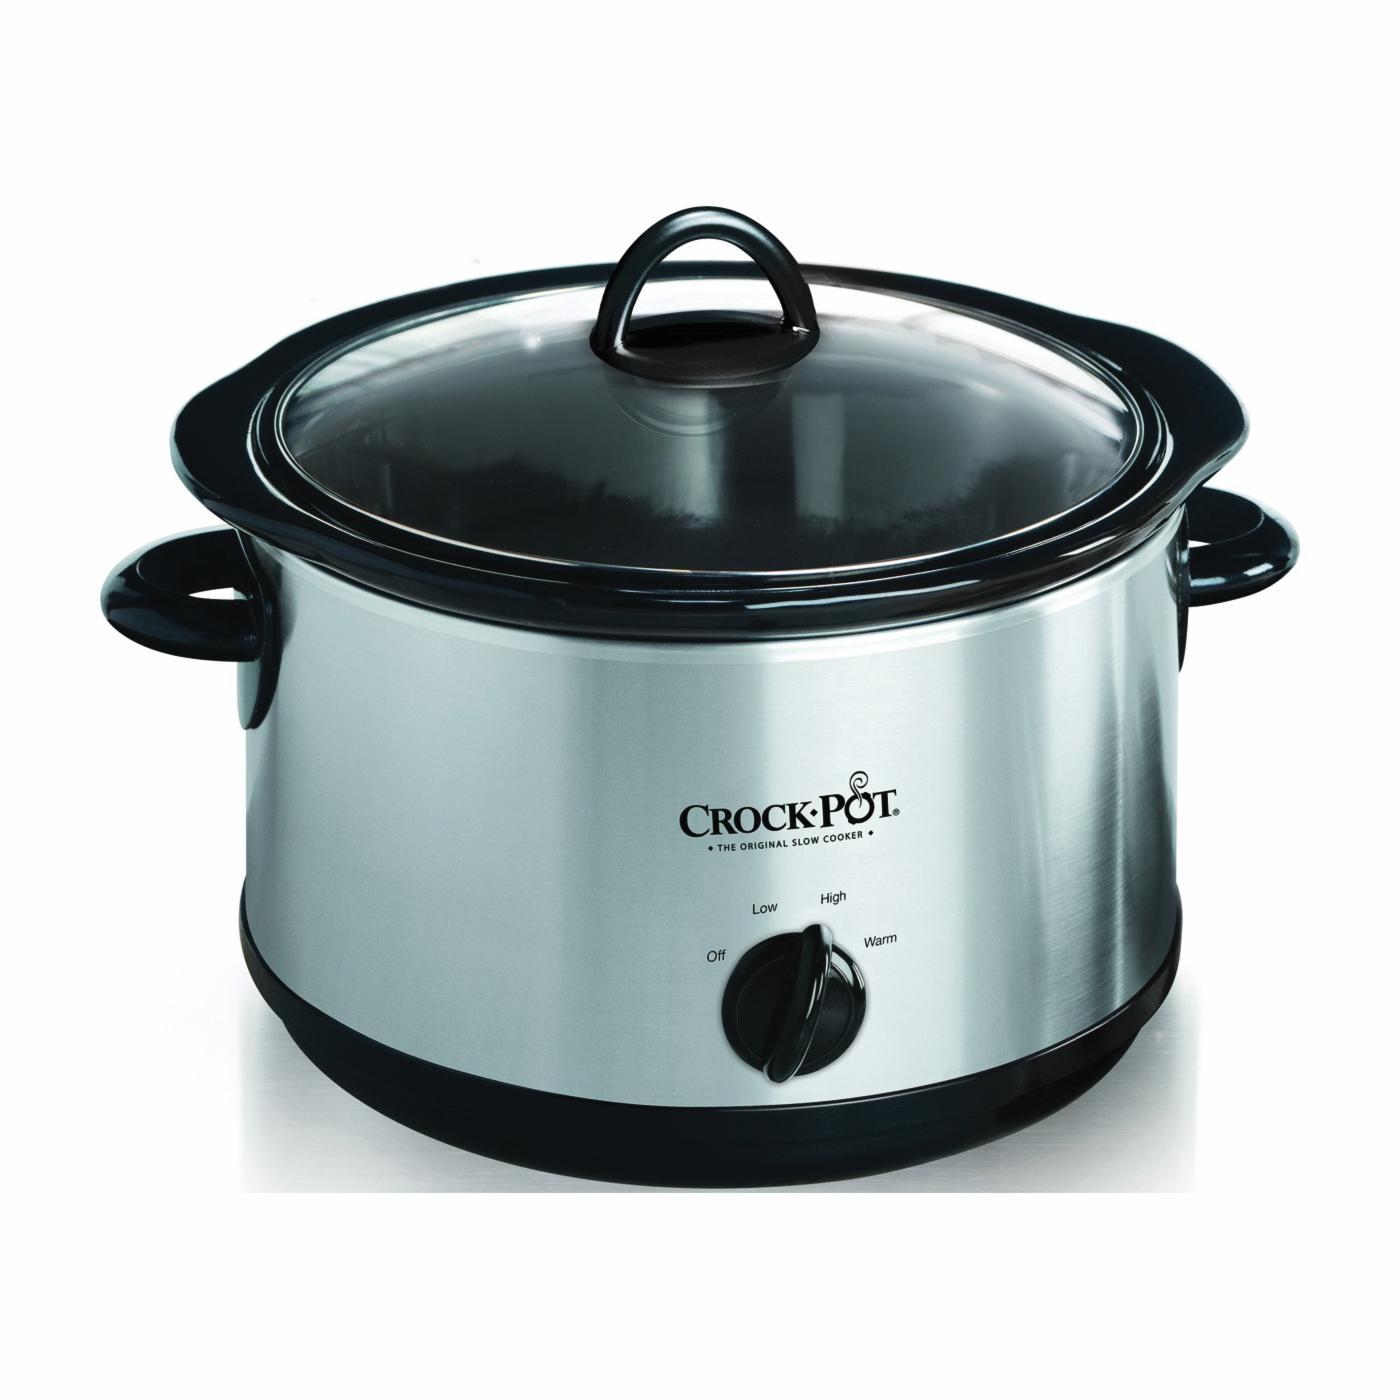 Crock-Pot SCR450-S